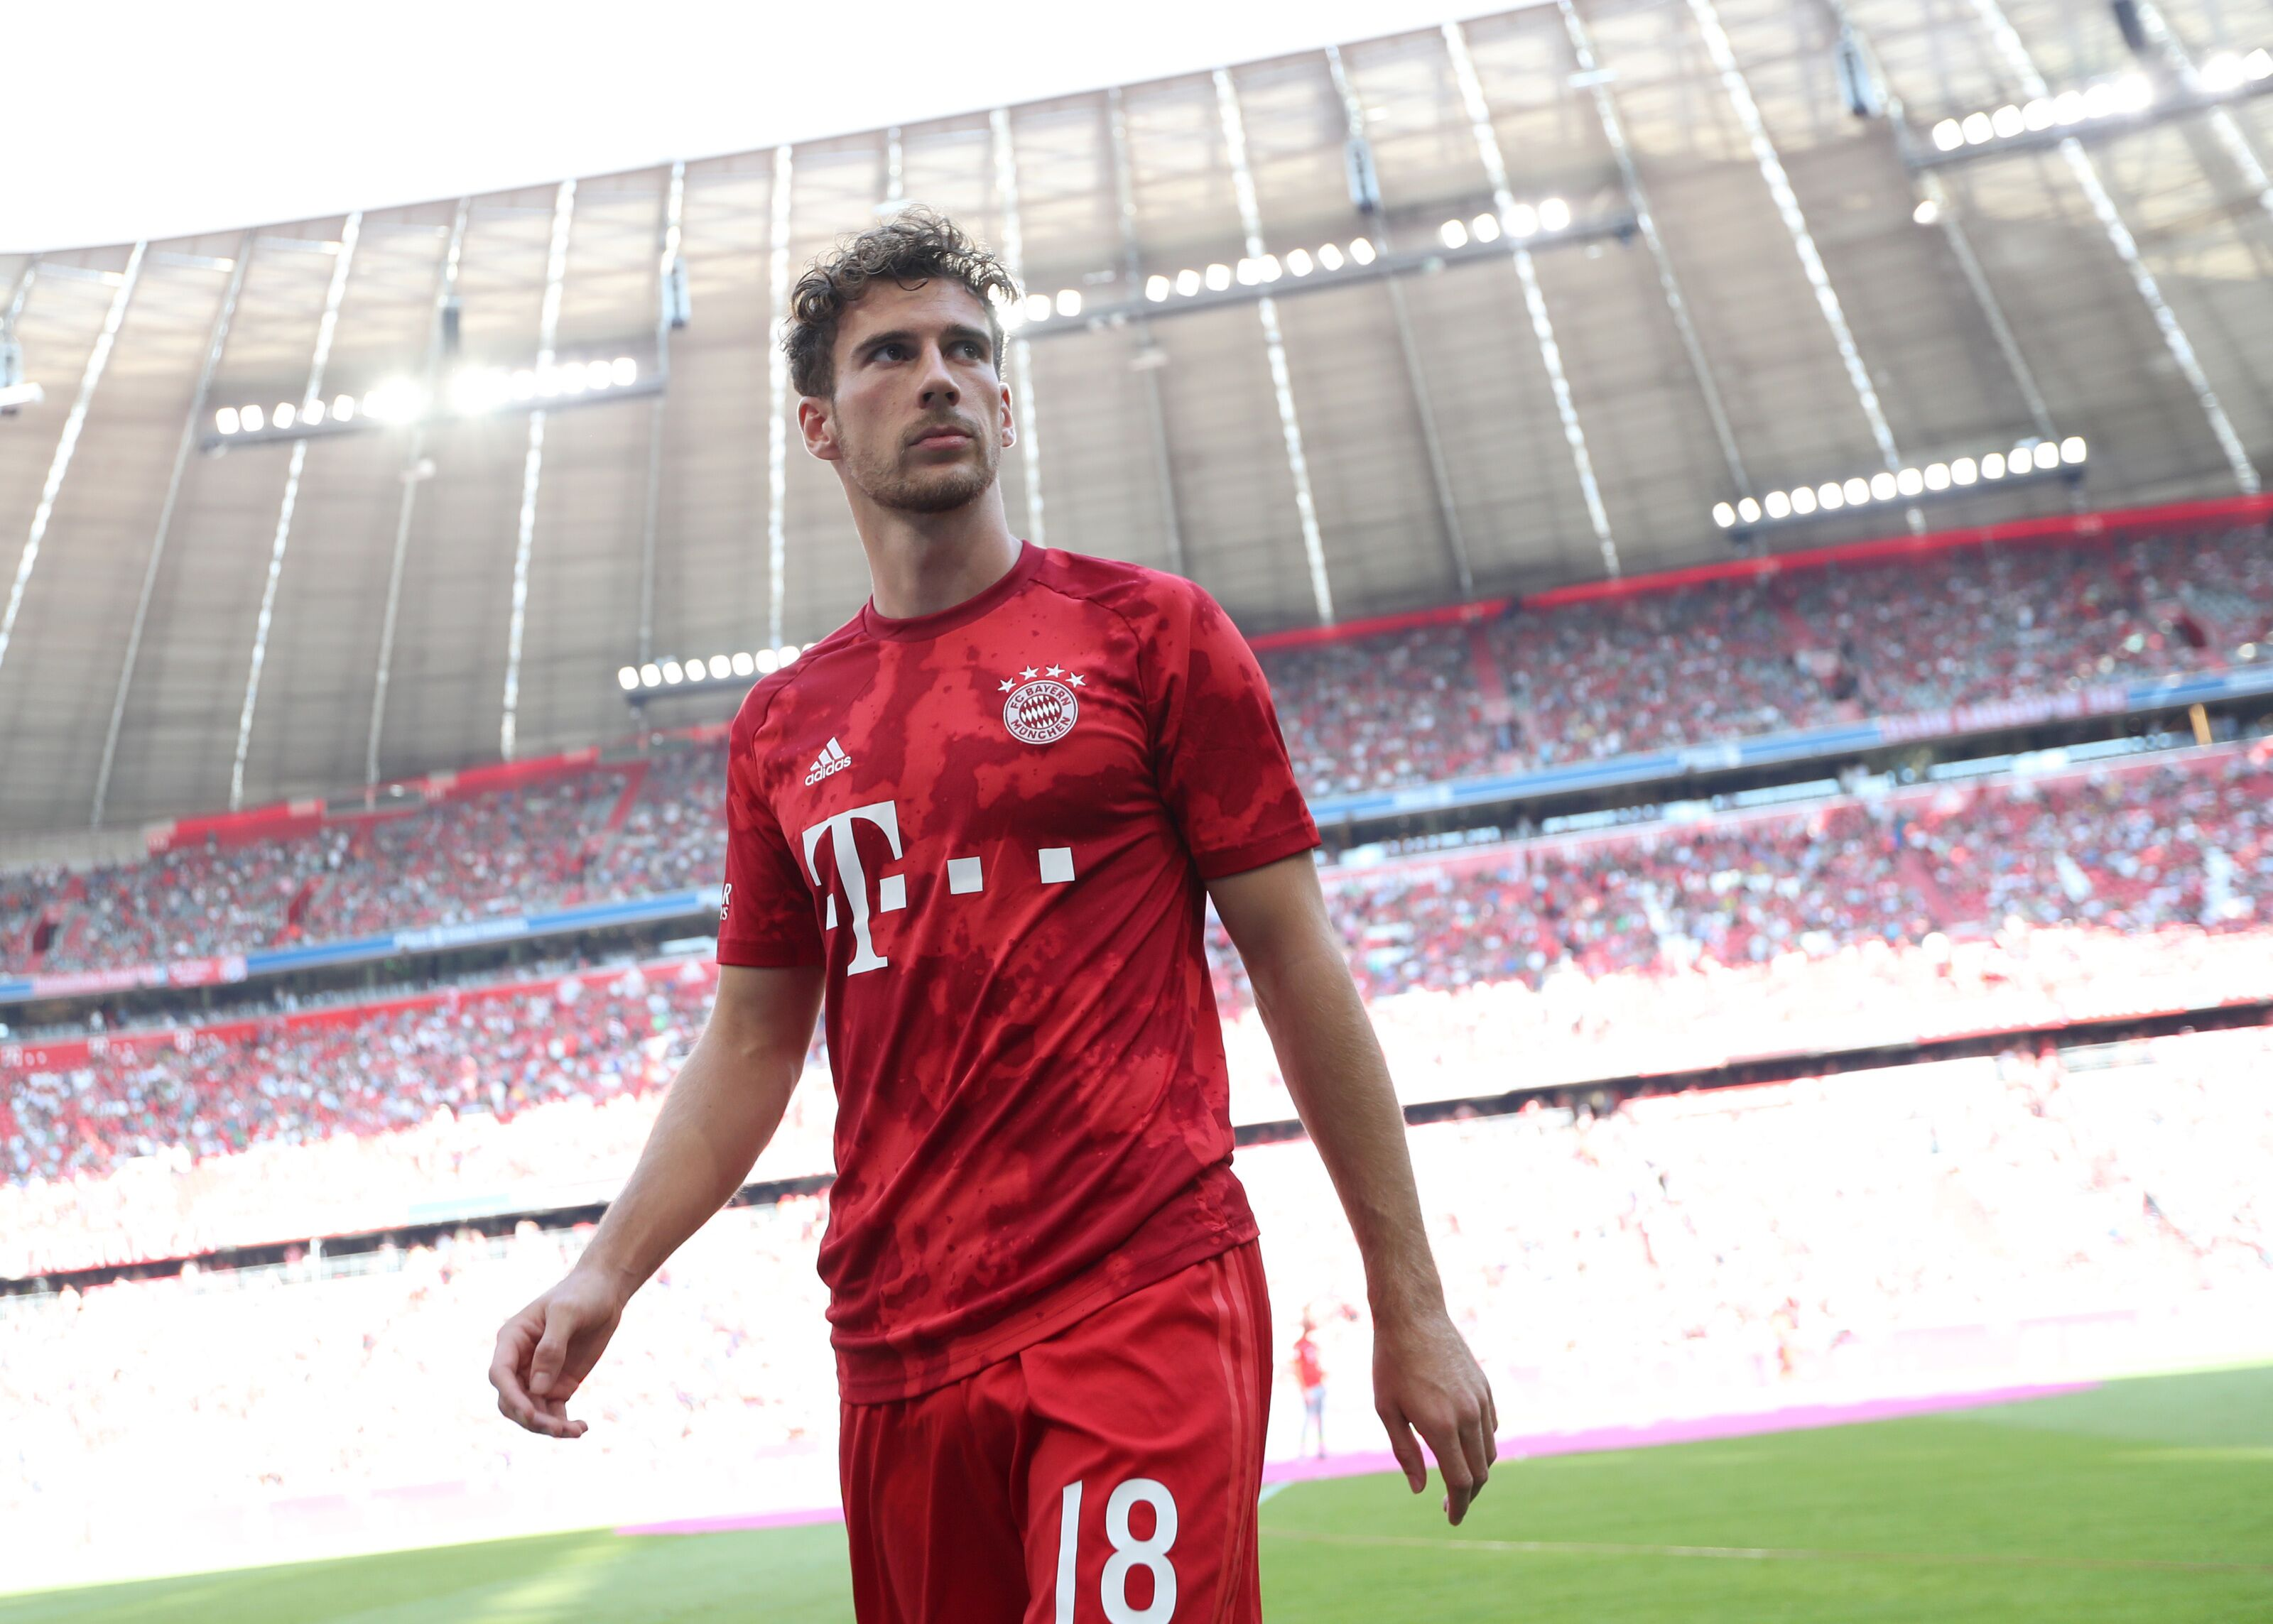 Bayern Munich midfielder Leon Goretzka set to be out for few weeks